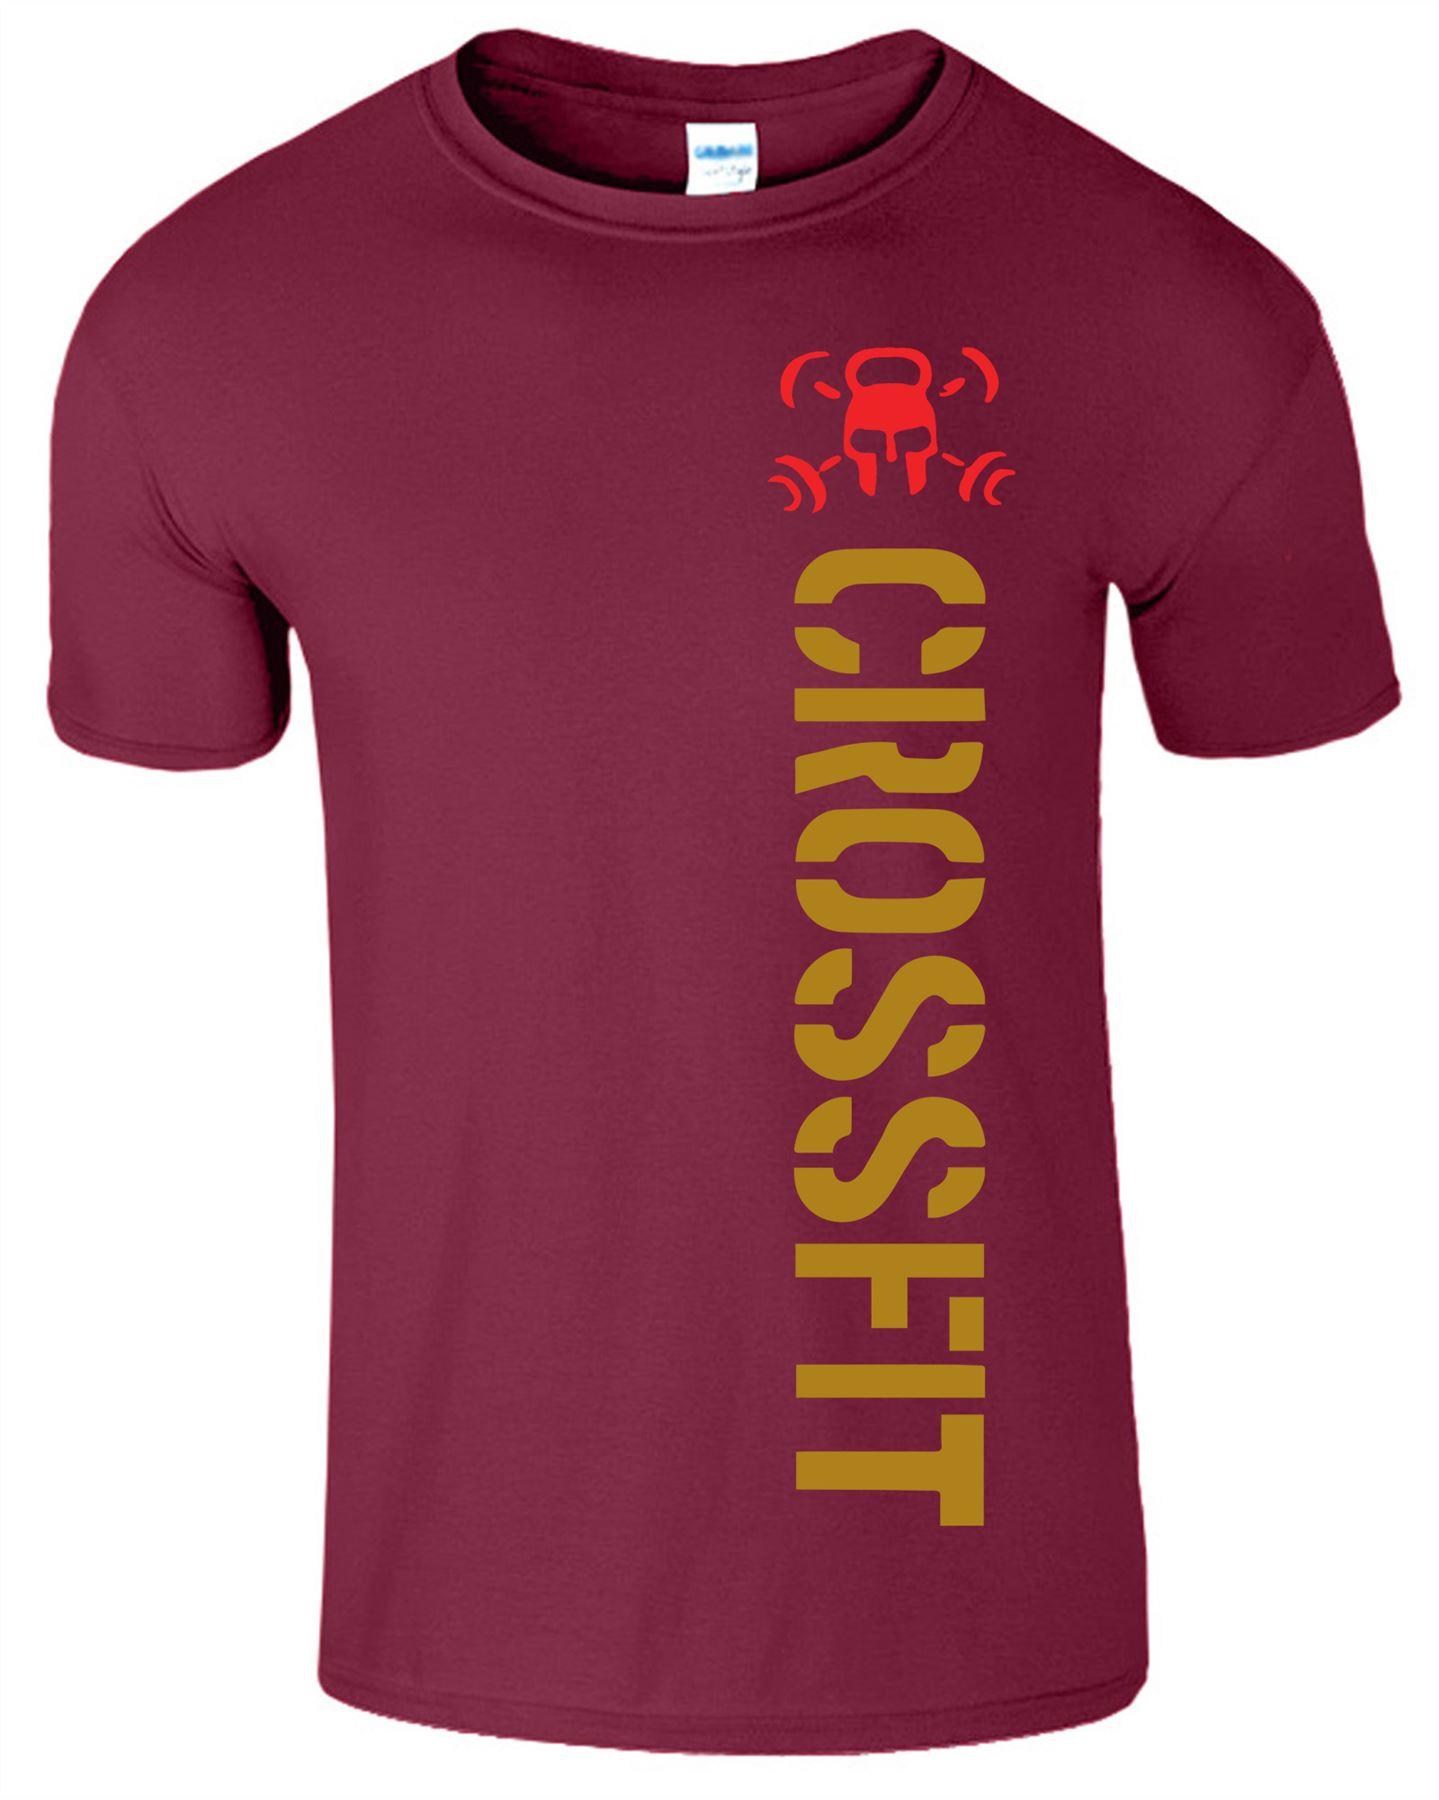 Crossfit-Mens-T-Shirt-Gym-Wear-Bodybuilding-Training-Workout-Fitness-T-Shirt Indexbild 14